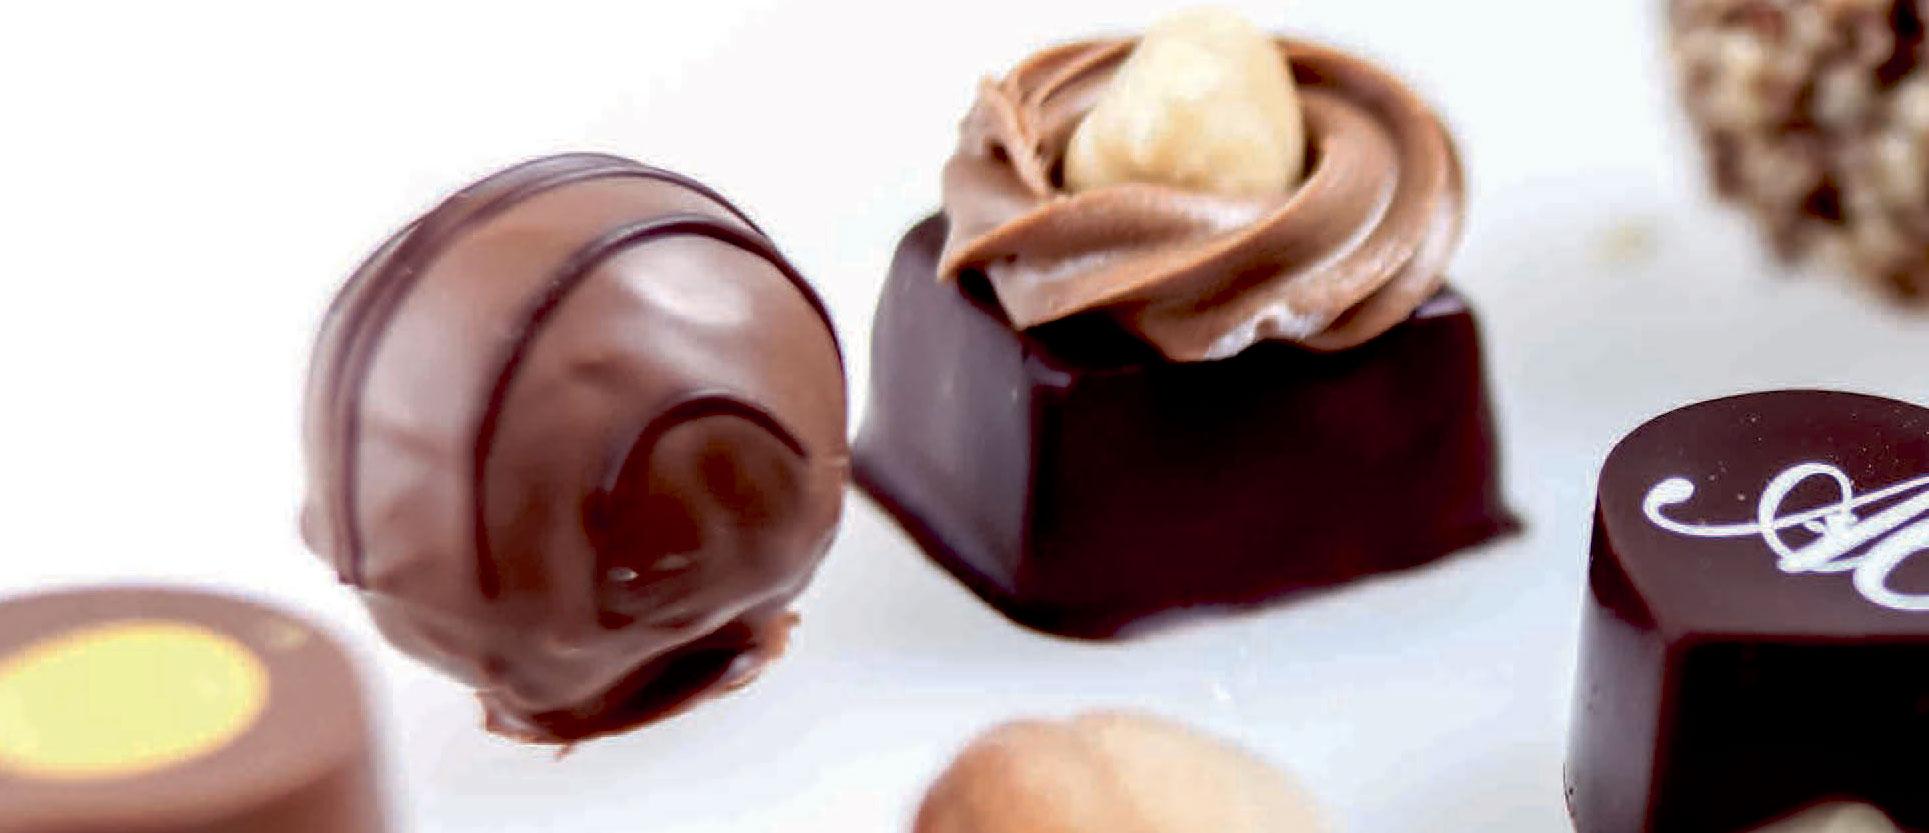 aalborg chokoladen job